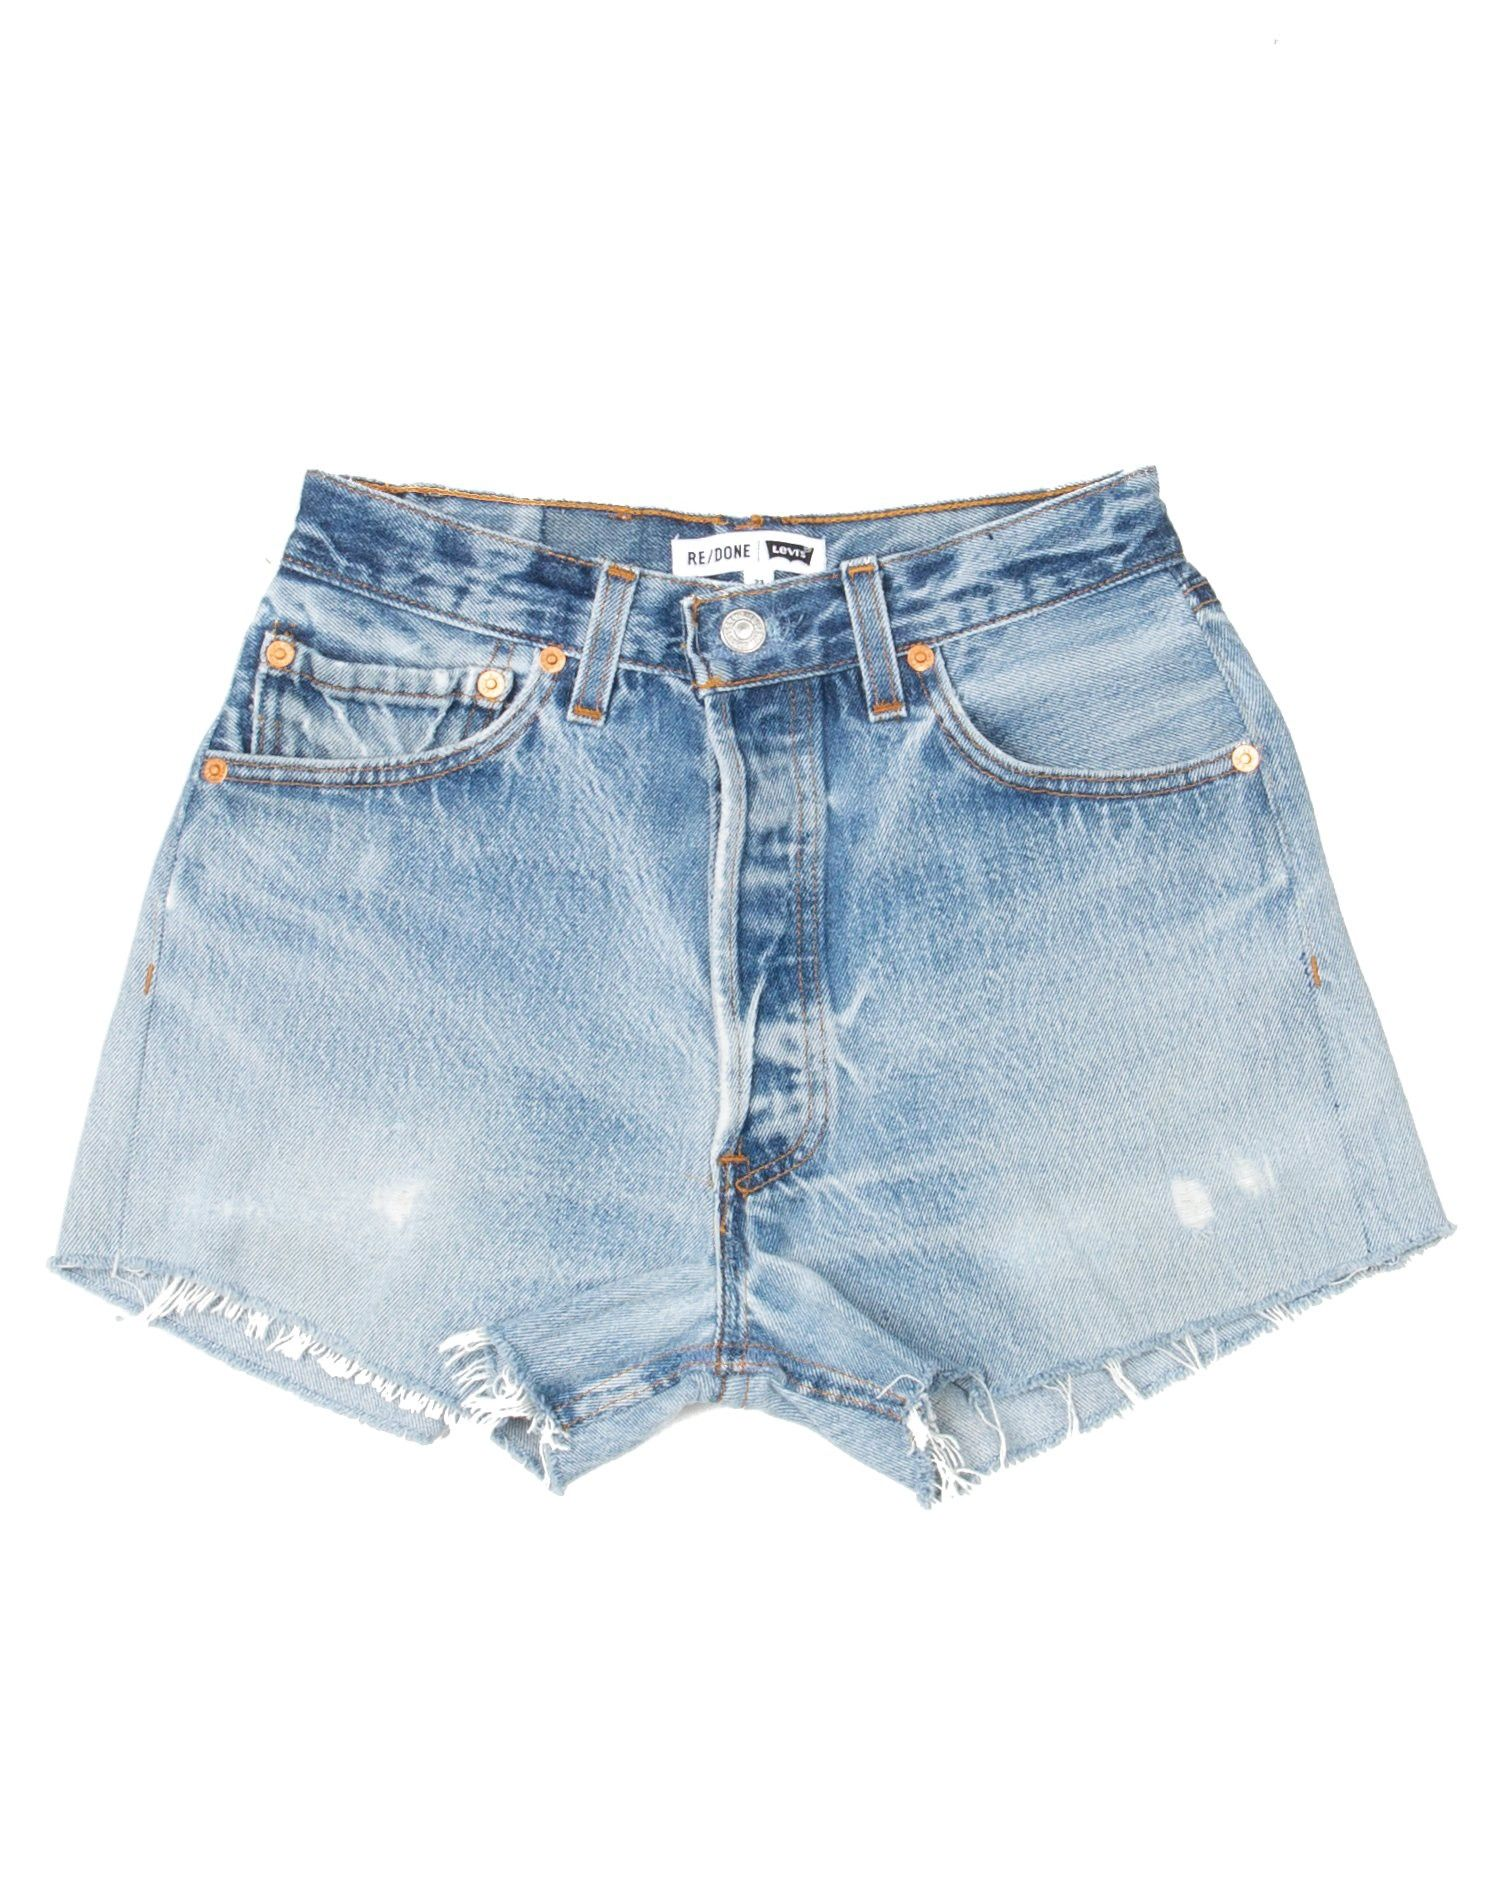 Re Done No 23hds1150658 Medium Blue 23 Vintage Denim Shorts Denim Shorts Women Denim Shorts Style